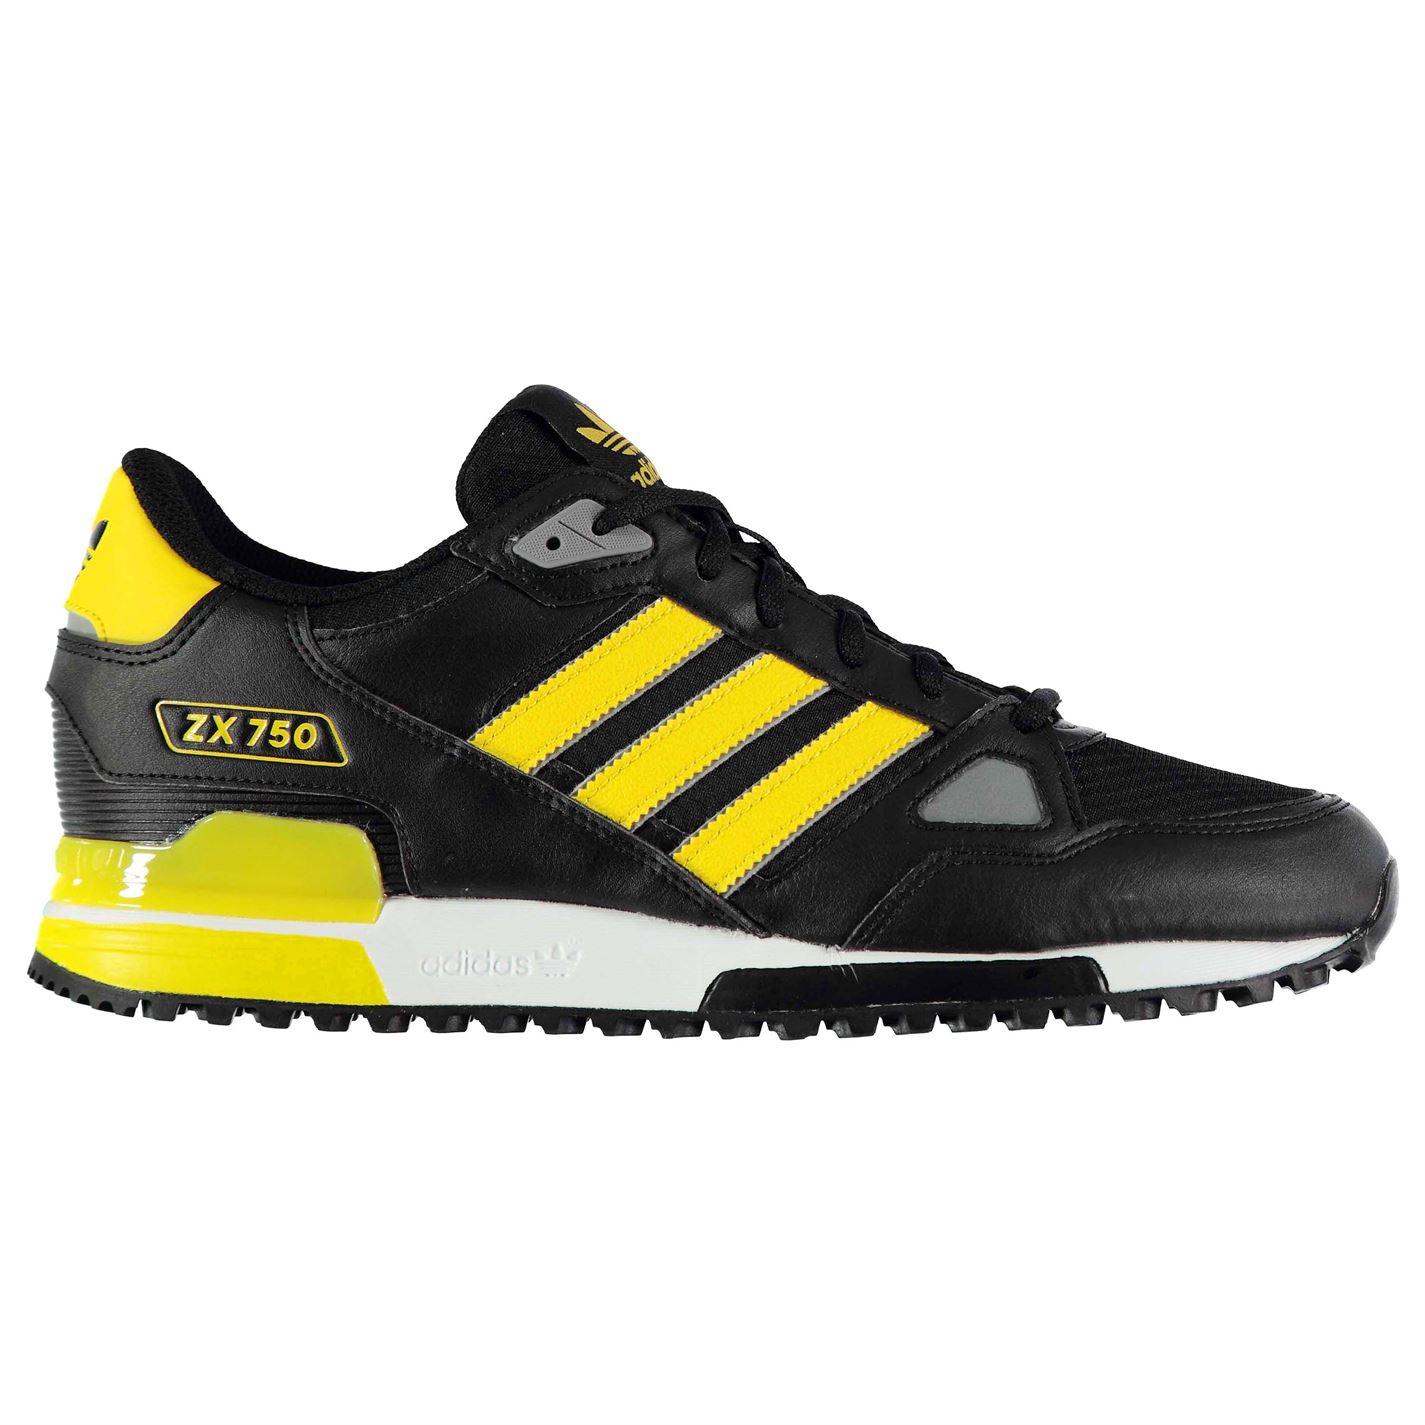 Adidas Originals ZX 750 Trainers